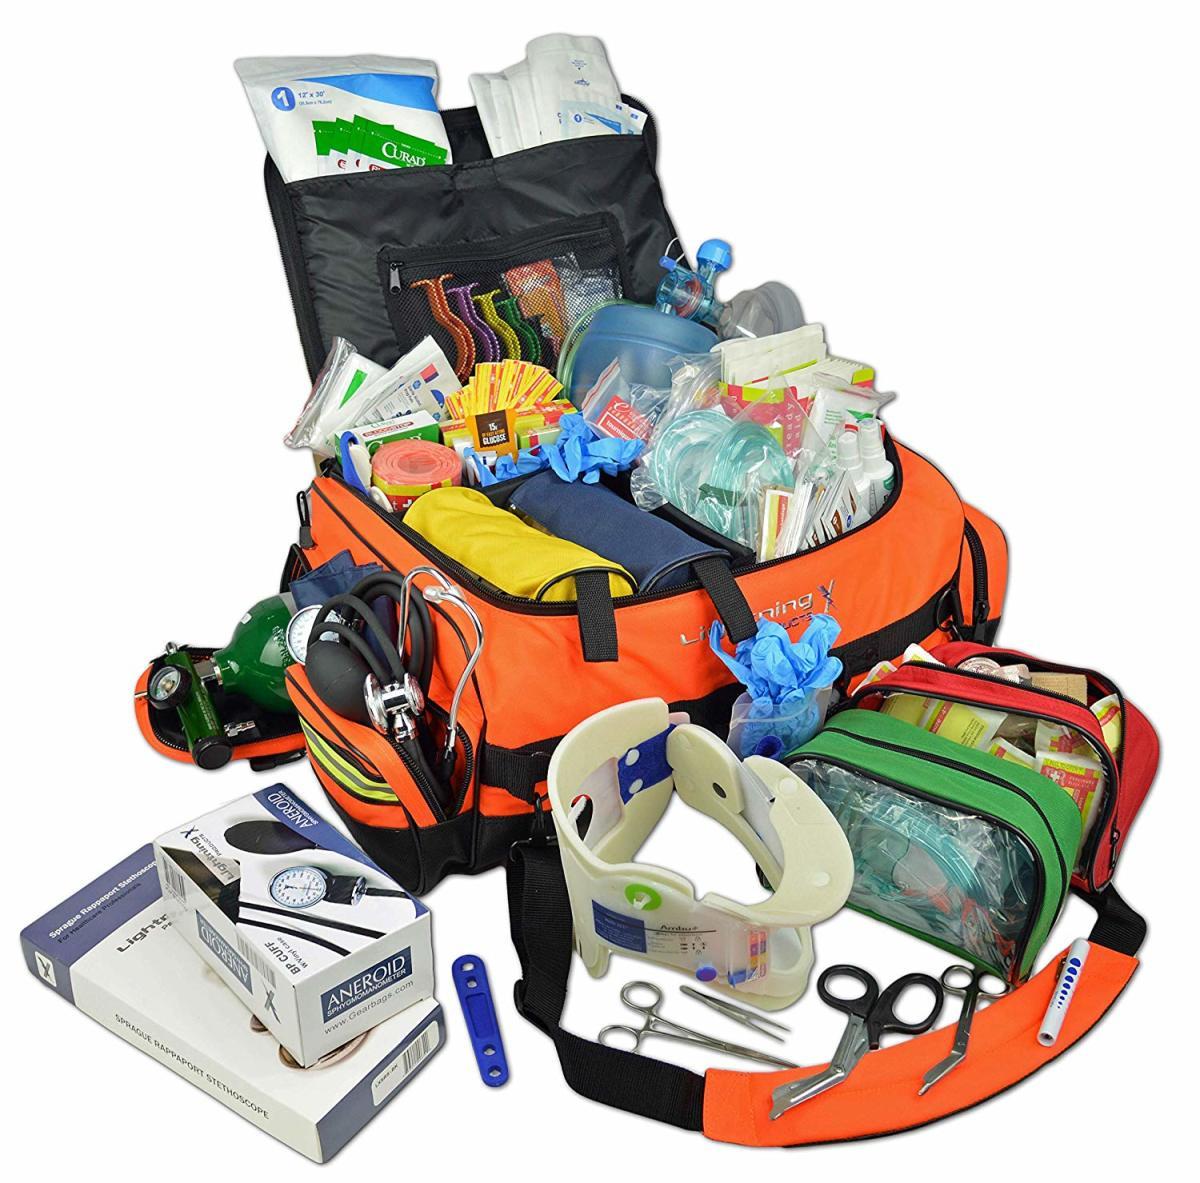 Lightning X Jumbo Stocked EMT Trauma Bag